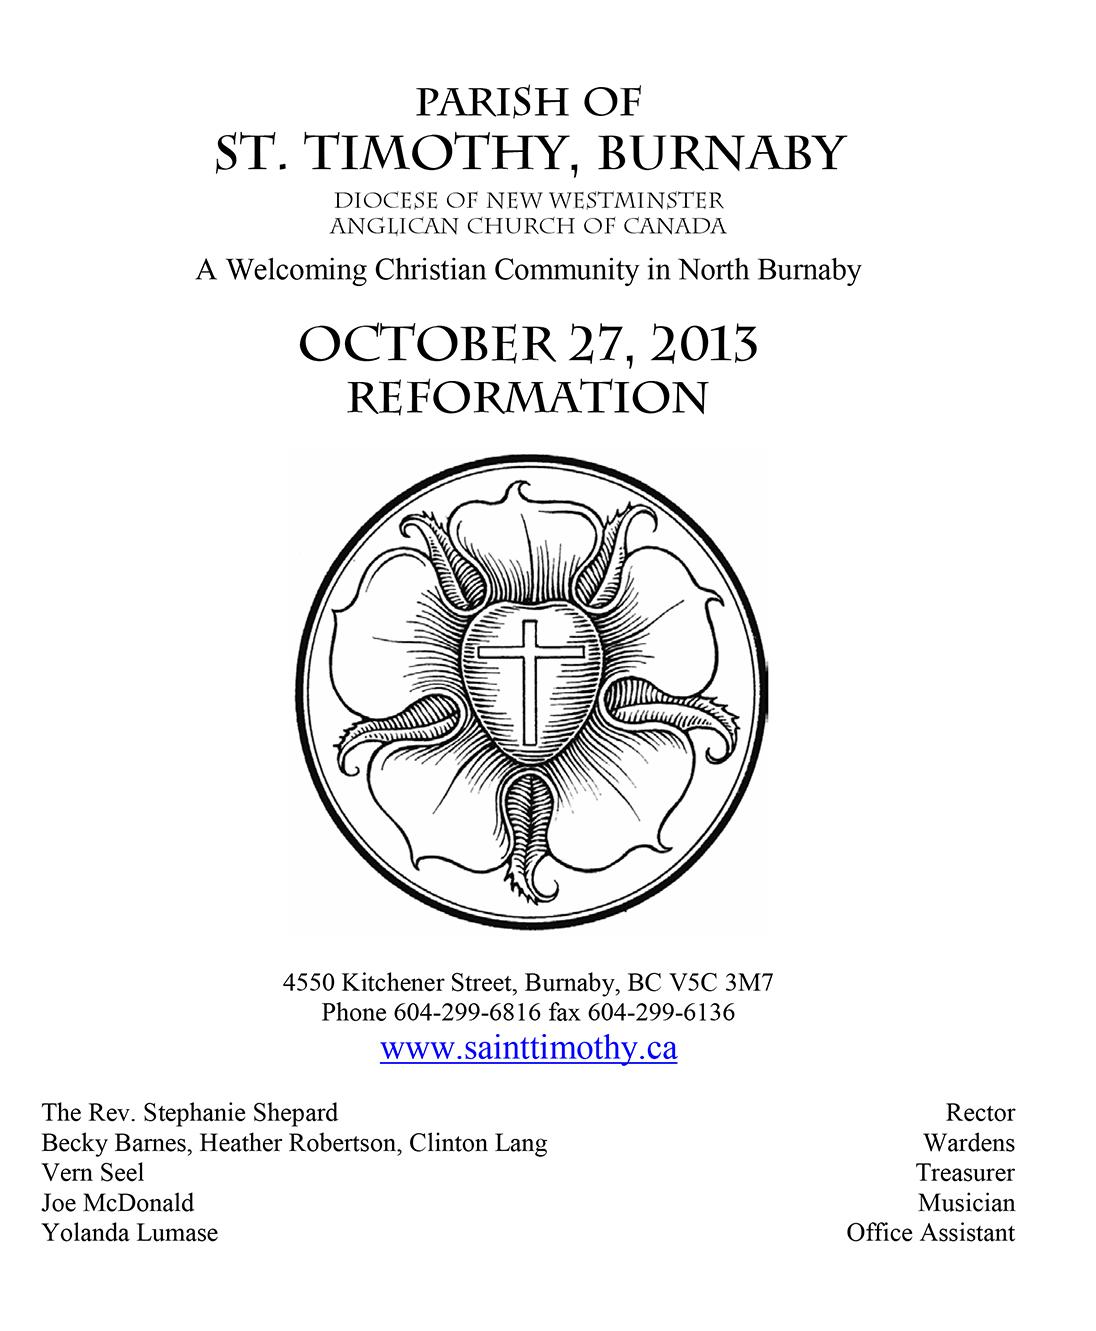 Bulletin: October 27, 2013